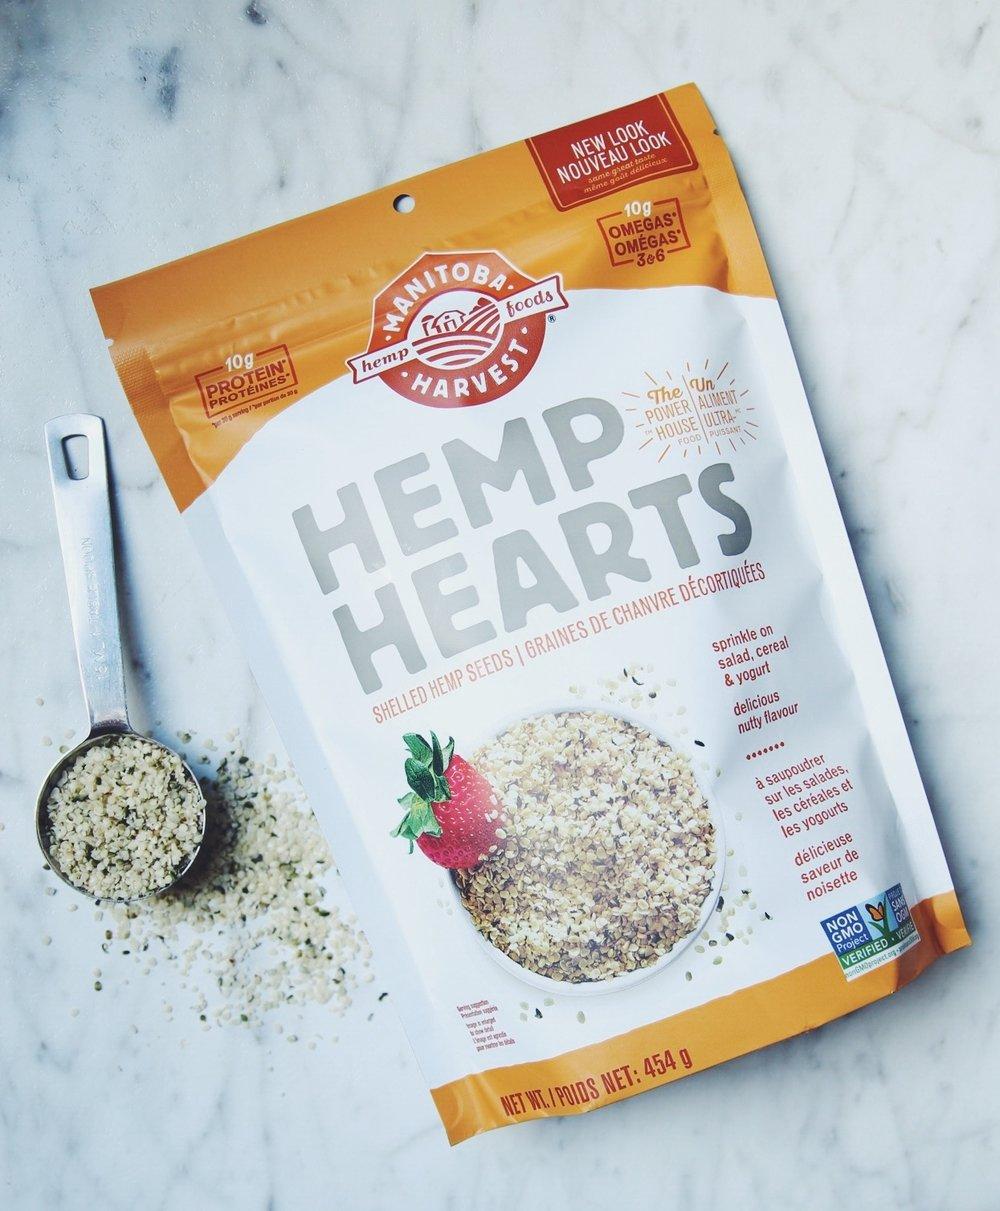 hemp hearts 3 ways_hot for food